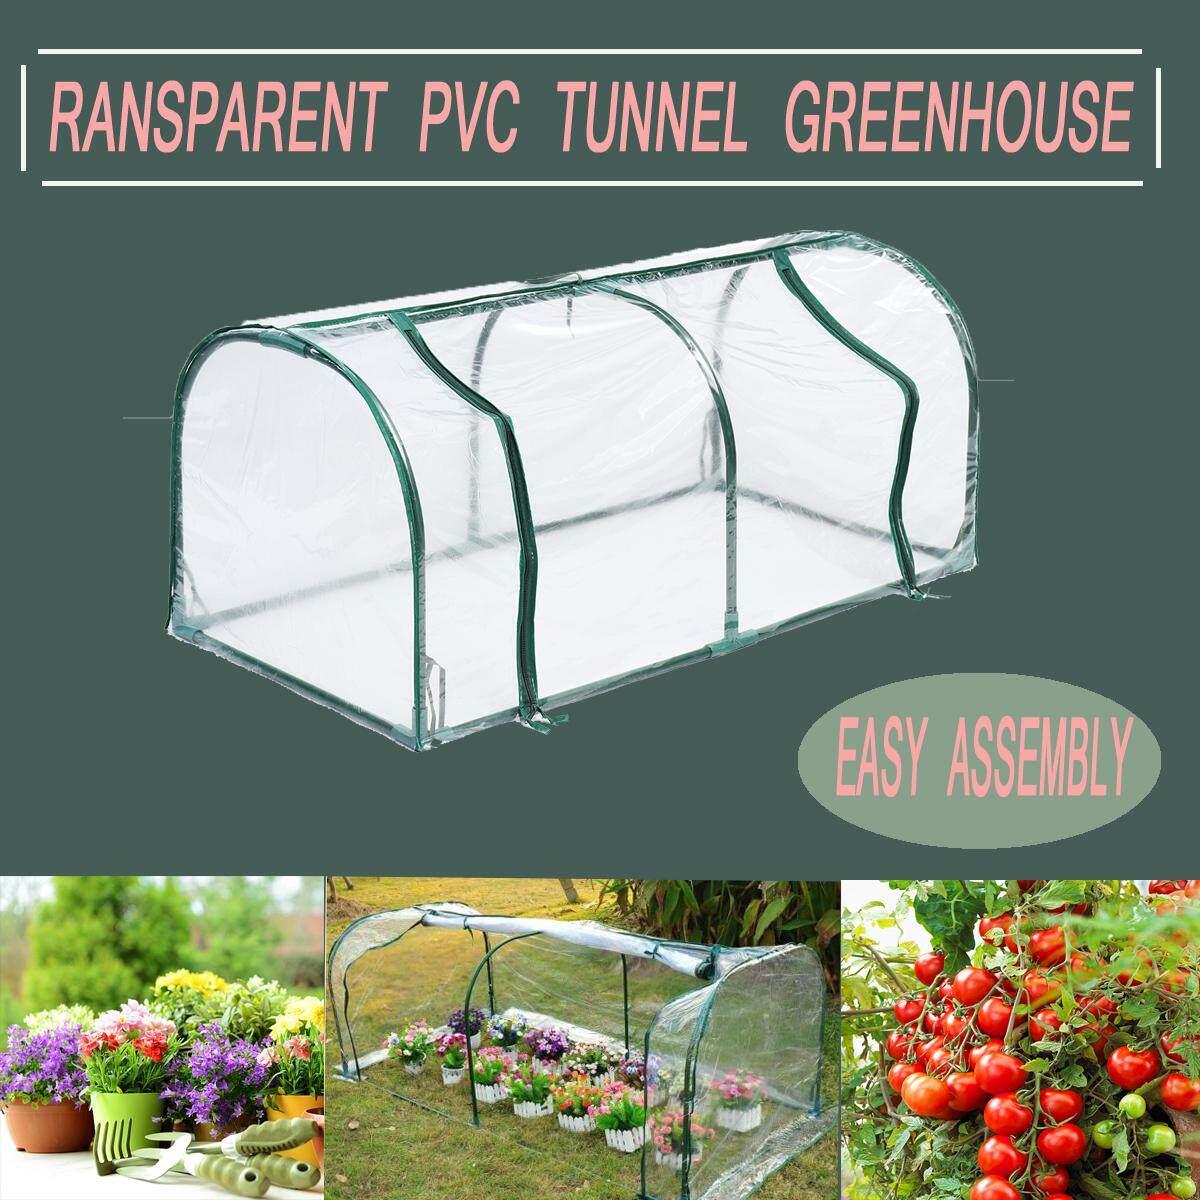 128x60x58cm Greenhouse Portable Gardening Flower House Plants Yard Hot Tunnel